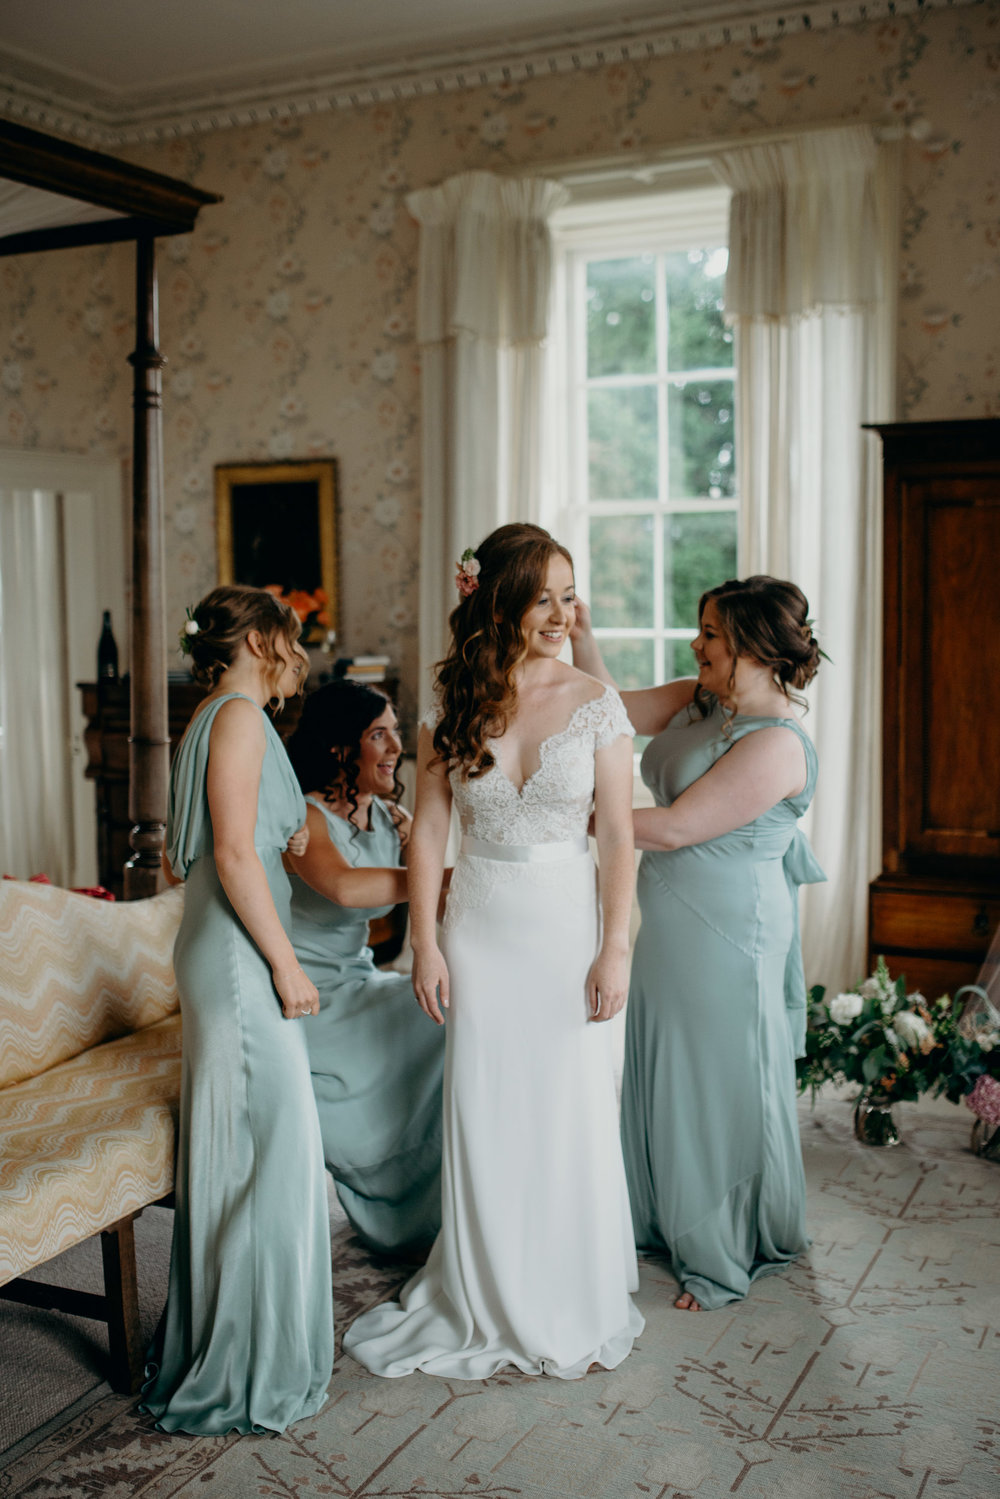 drenagh estate wedding photography-18.jpg